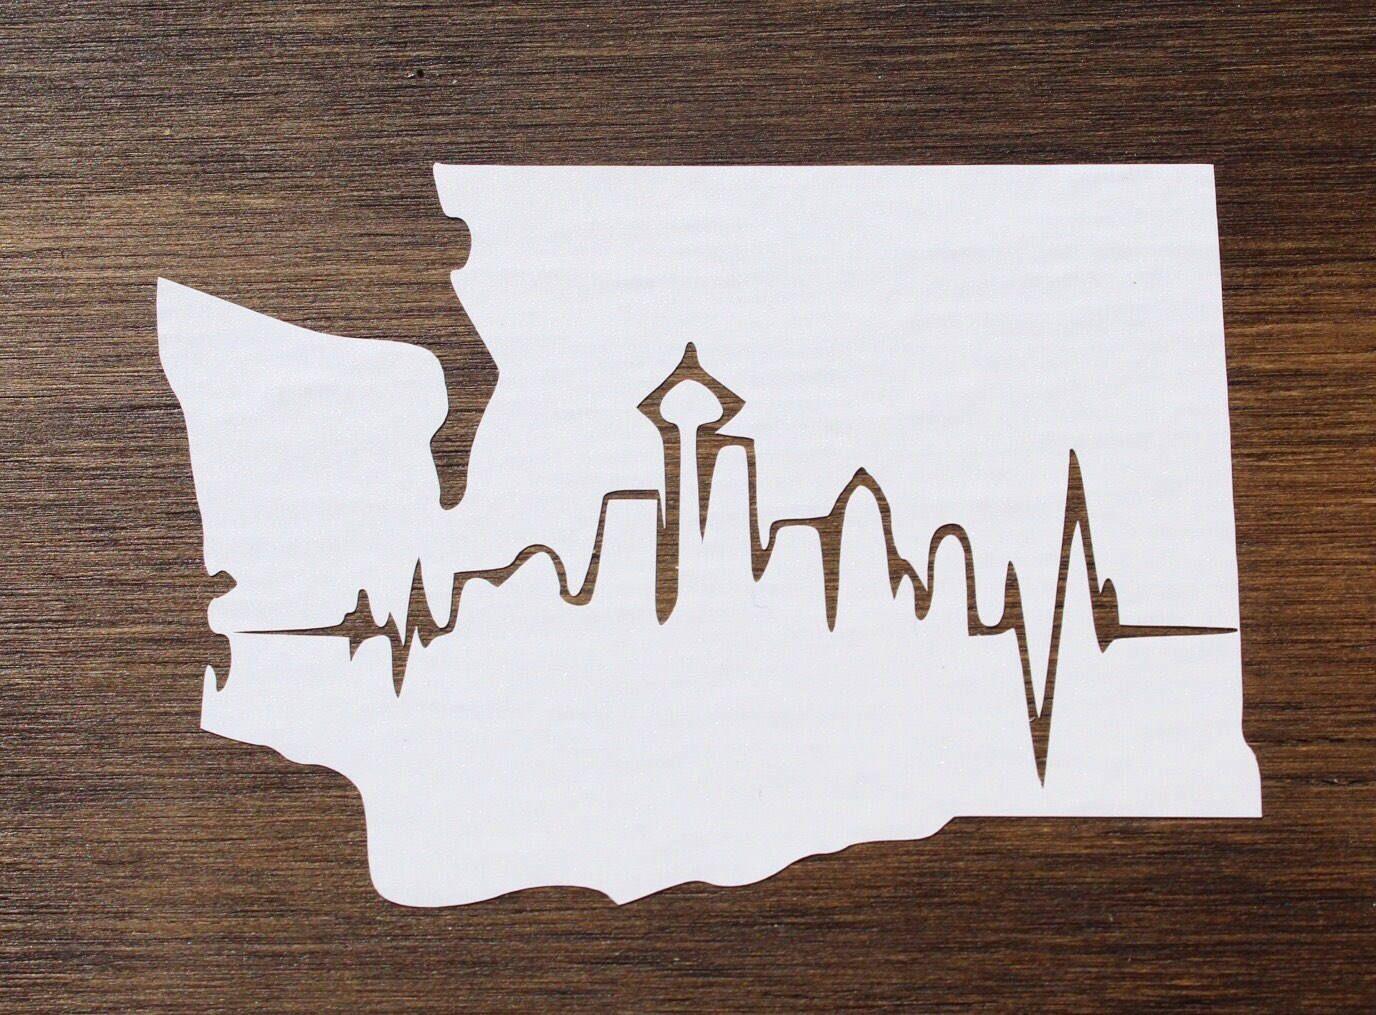 Washington State Decals Pnw Pacific Northwest Seattle Etsy Stamp Design Bumper Stickers Seattle Tattoo [ 1015 x 1376 Pixel ]